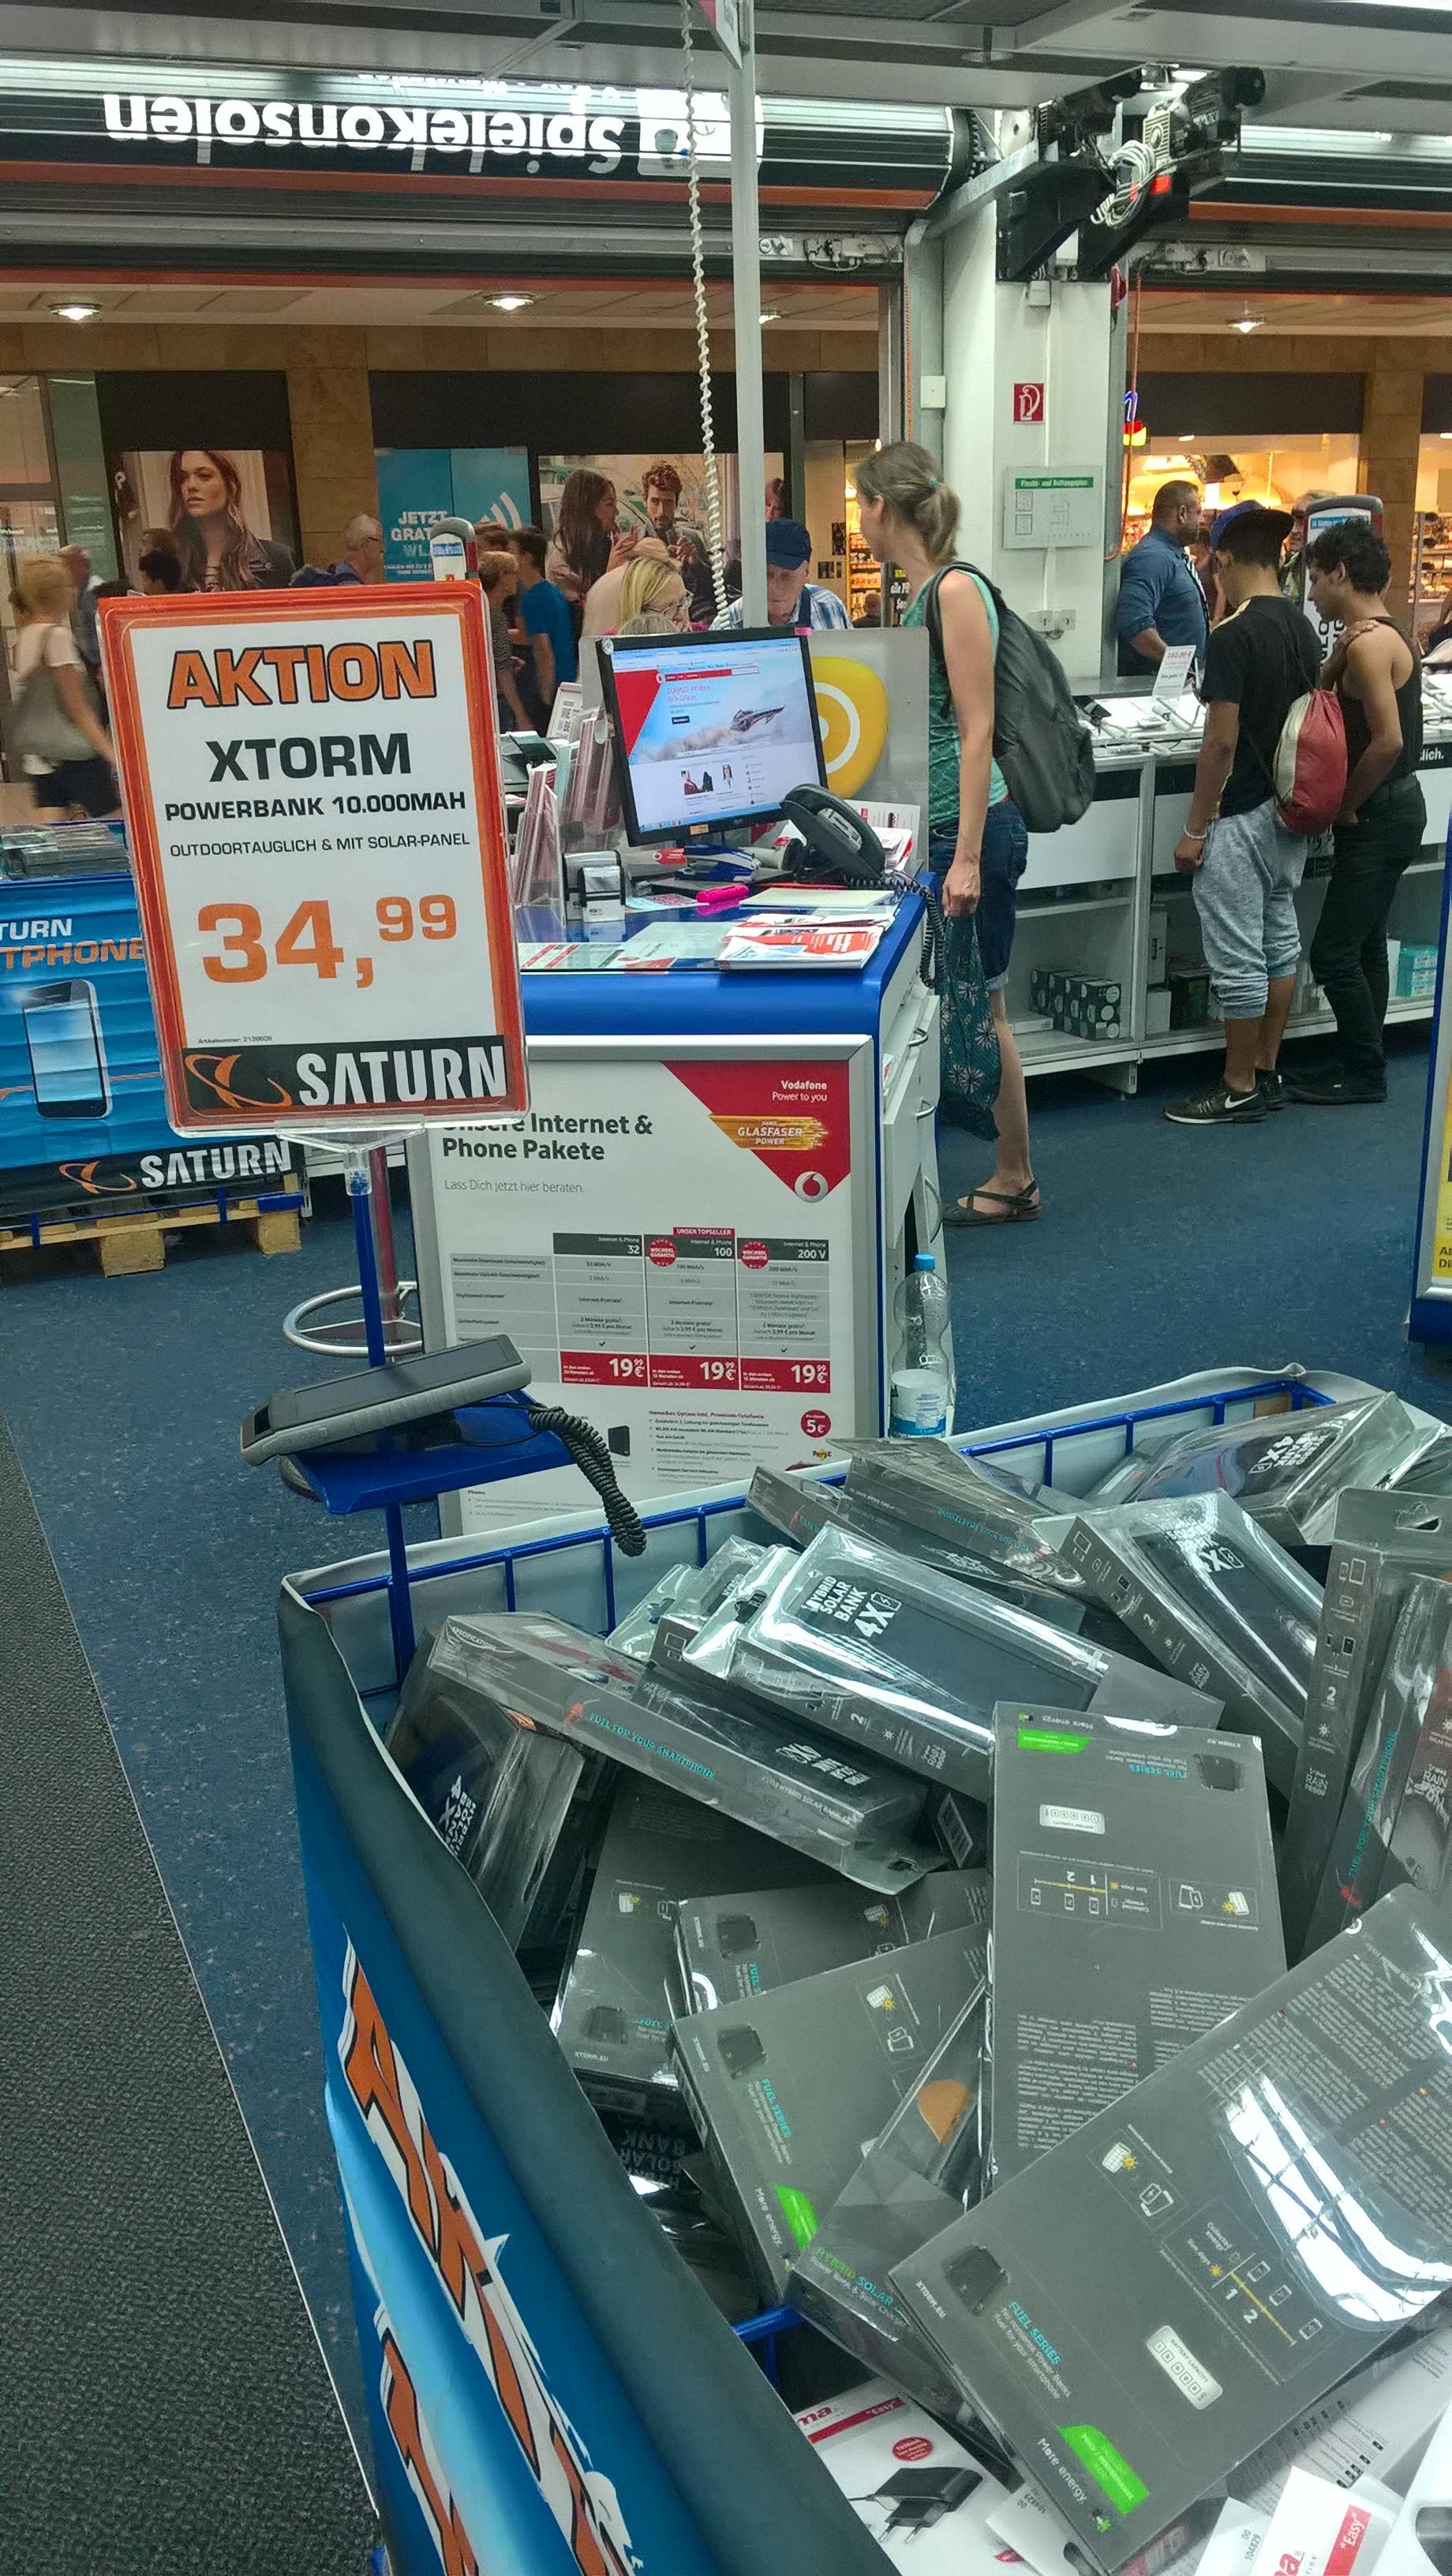 Solar Powerbank Xtorm 10.000mAh zum Bestpreis: 25€! Saturn Leipzig HBF